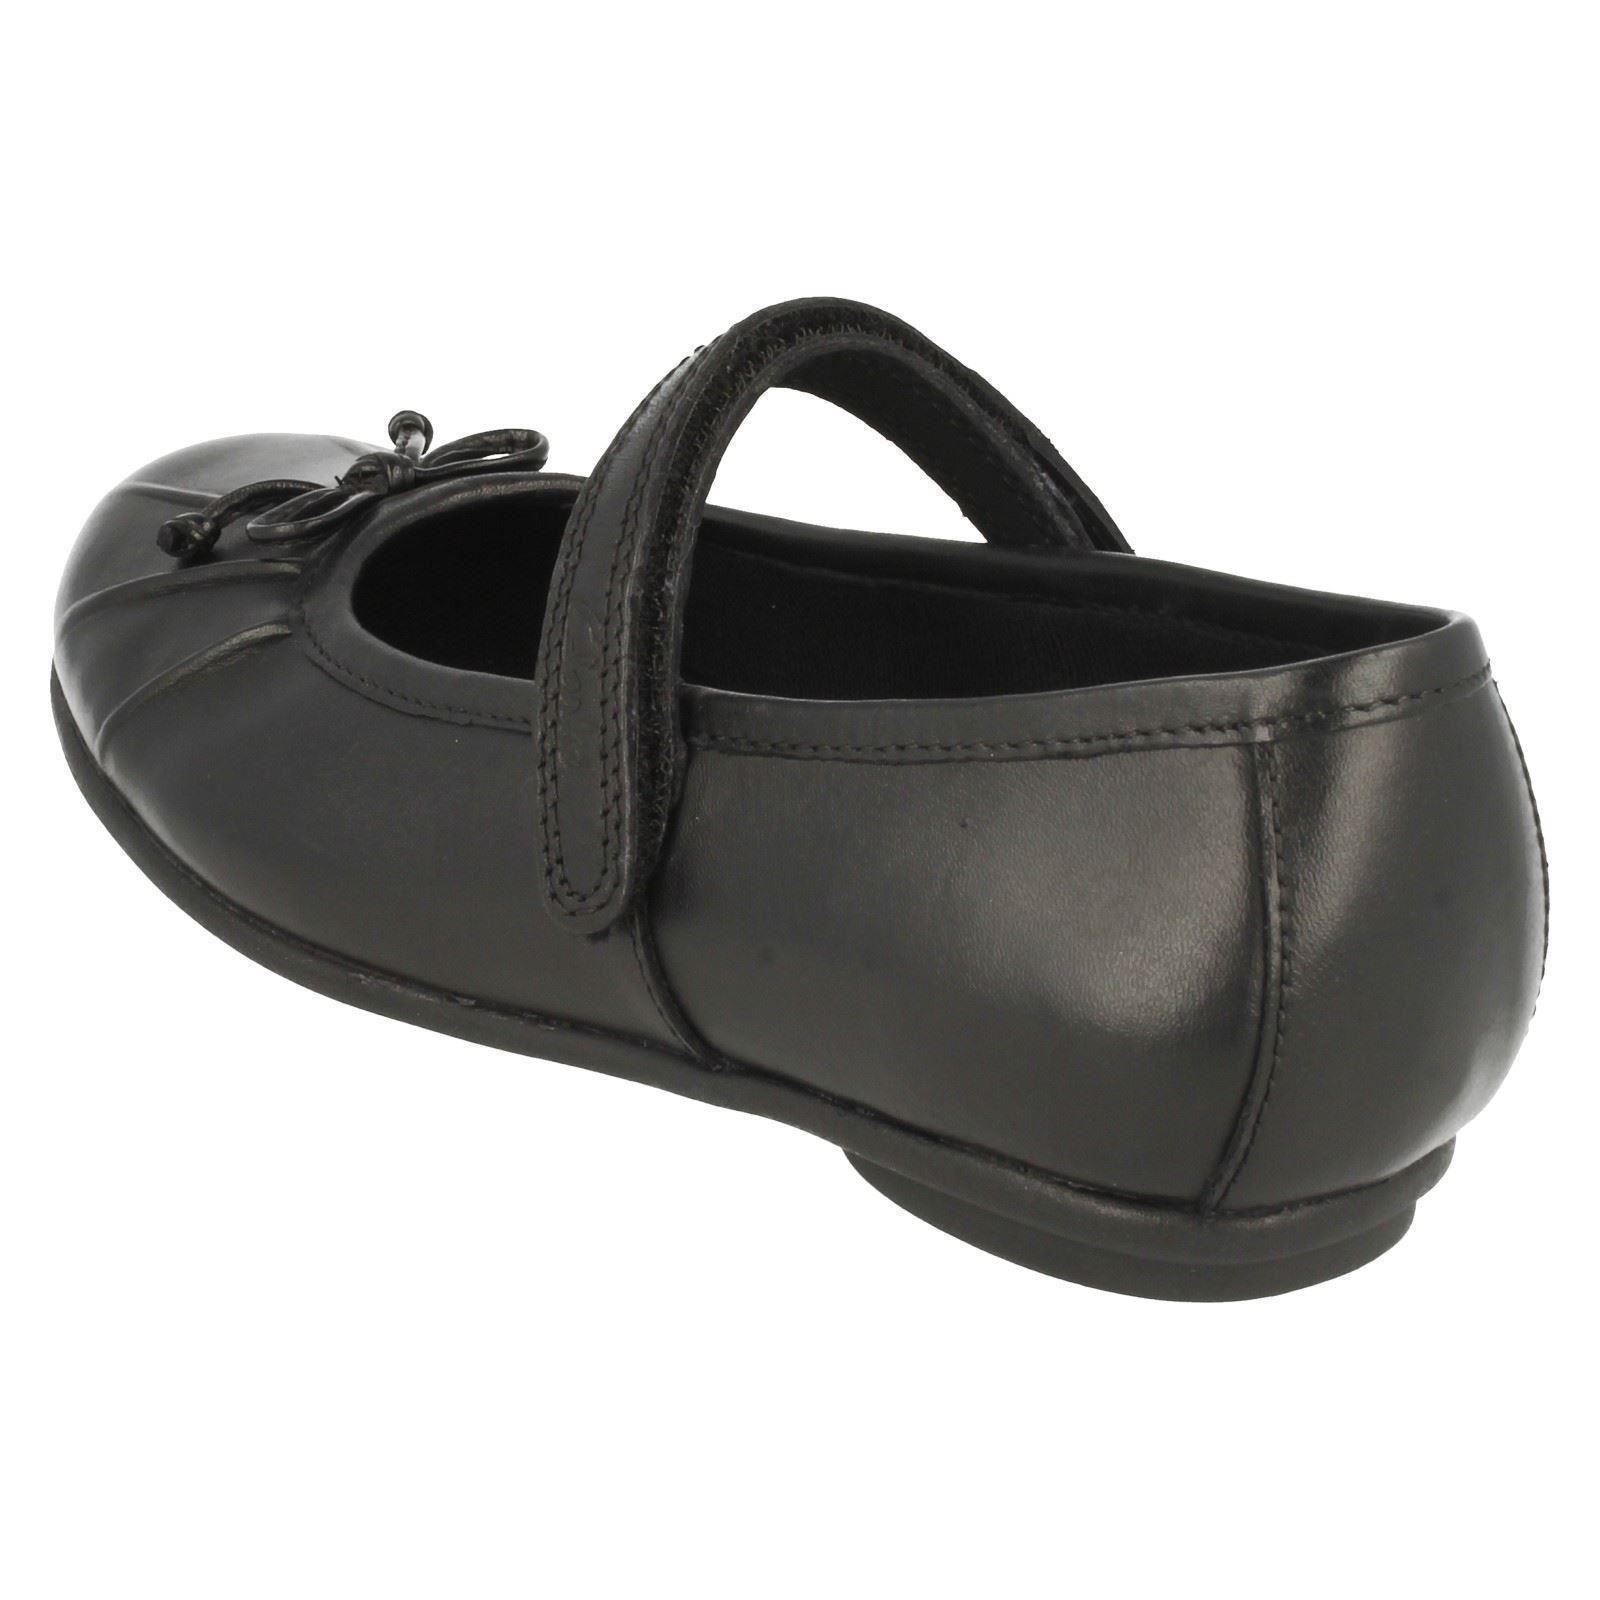 Girls Clarks Leather School Shoes Tasha Ally